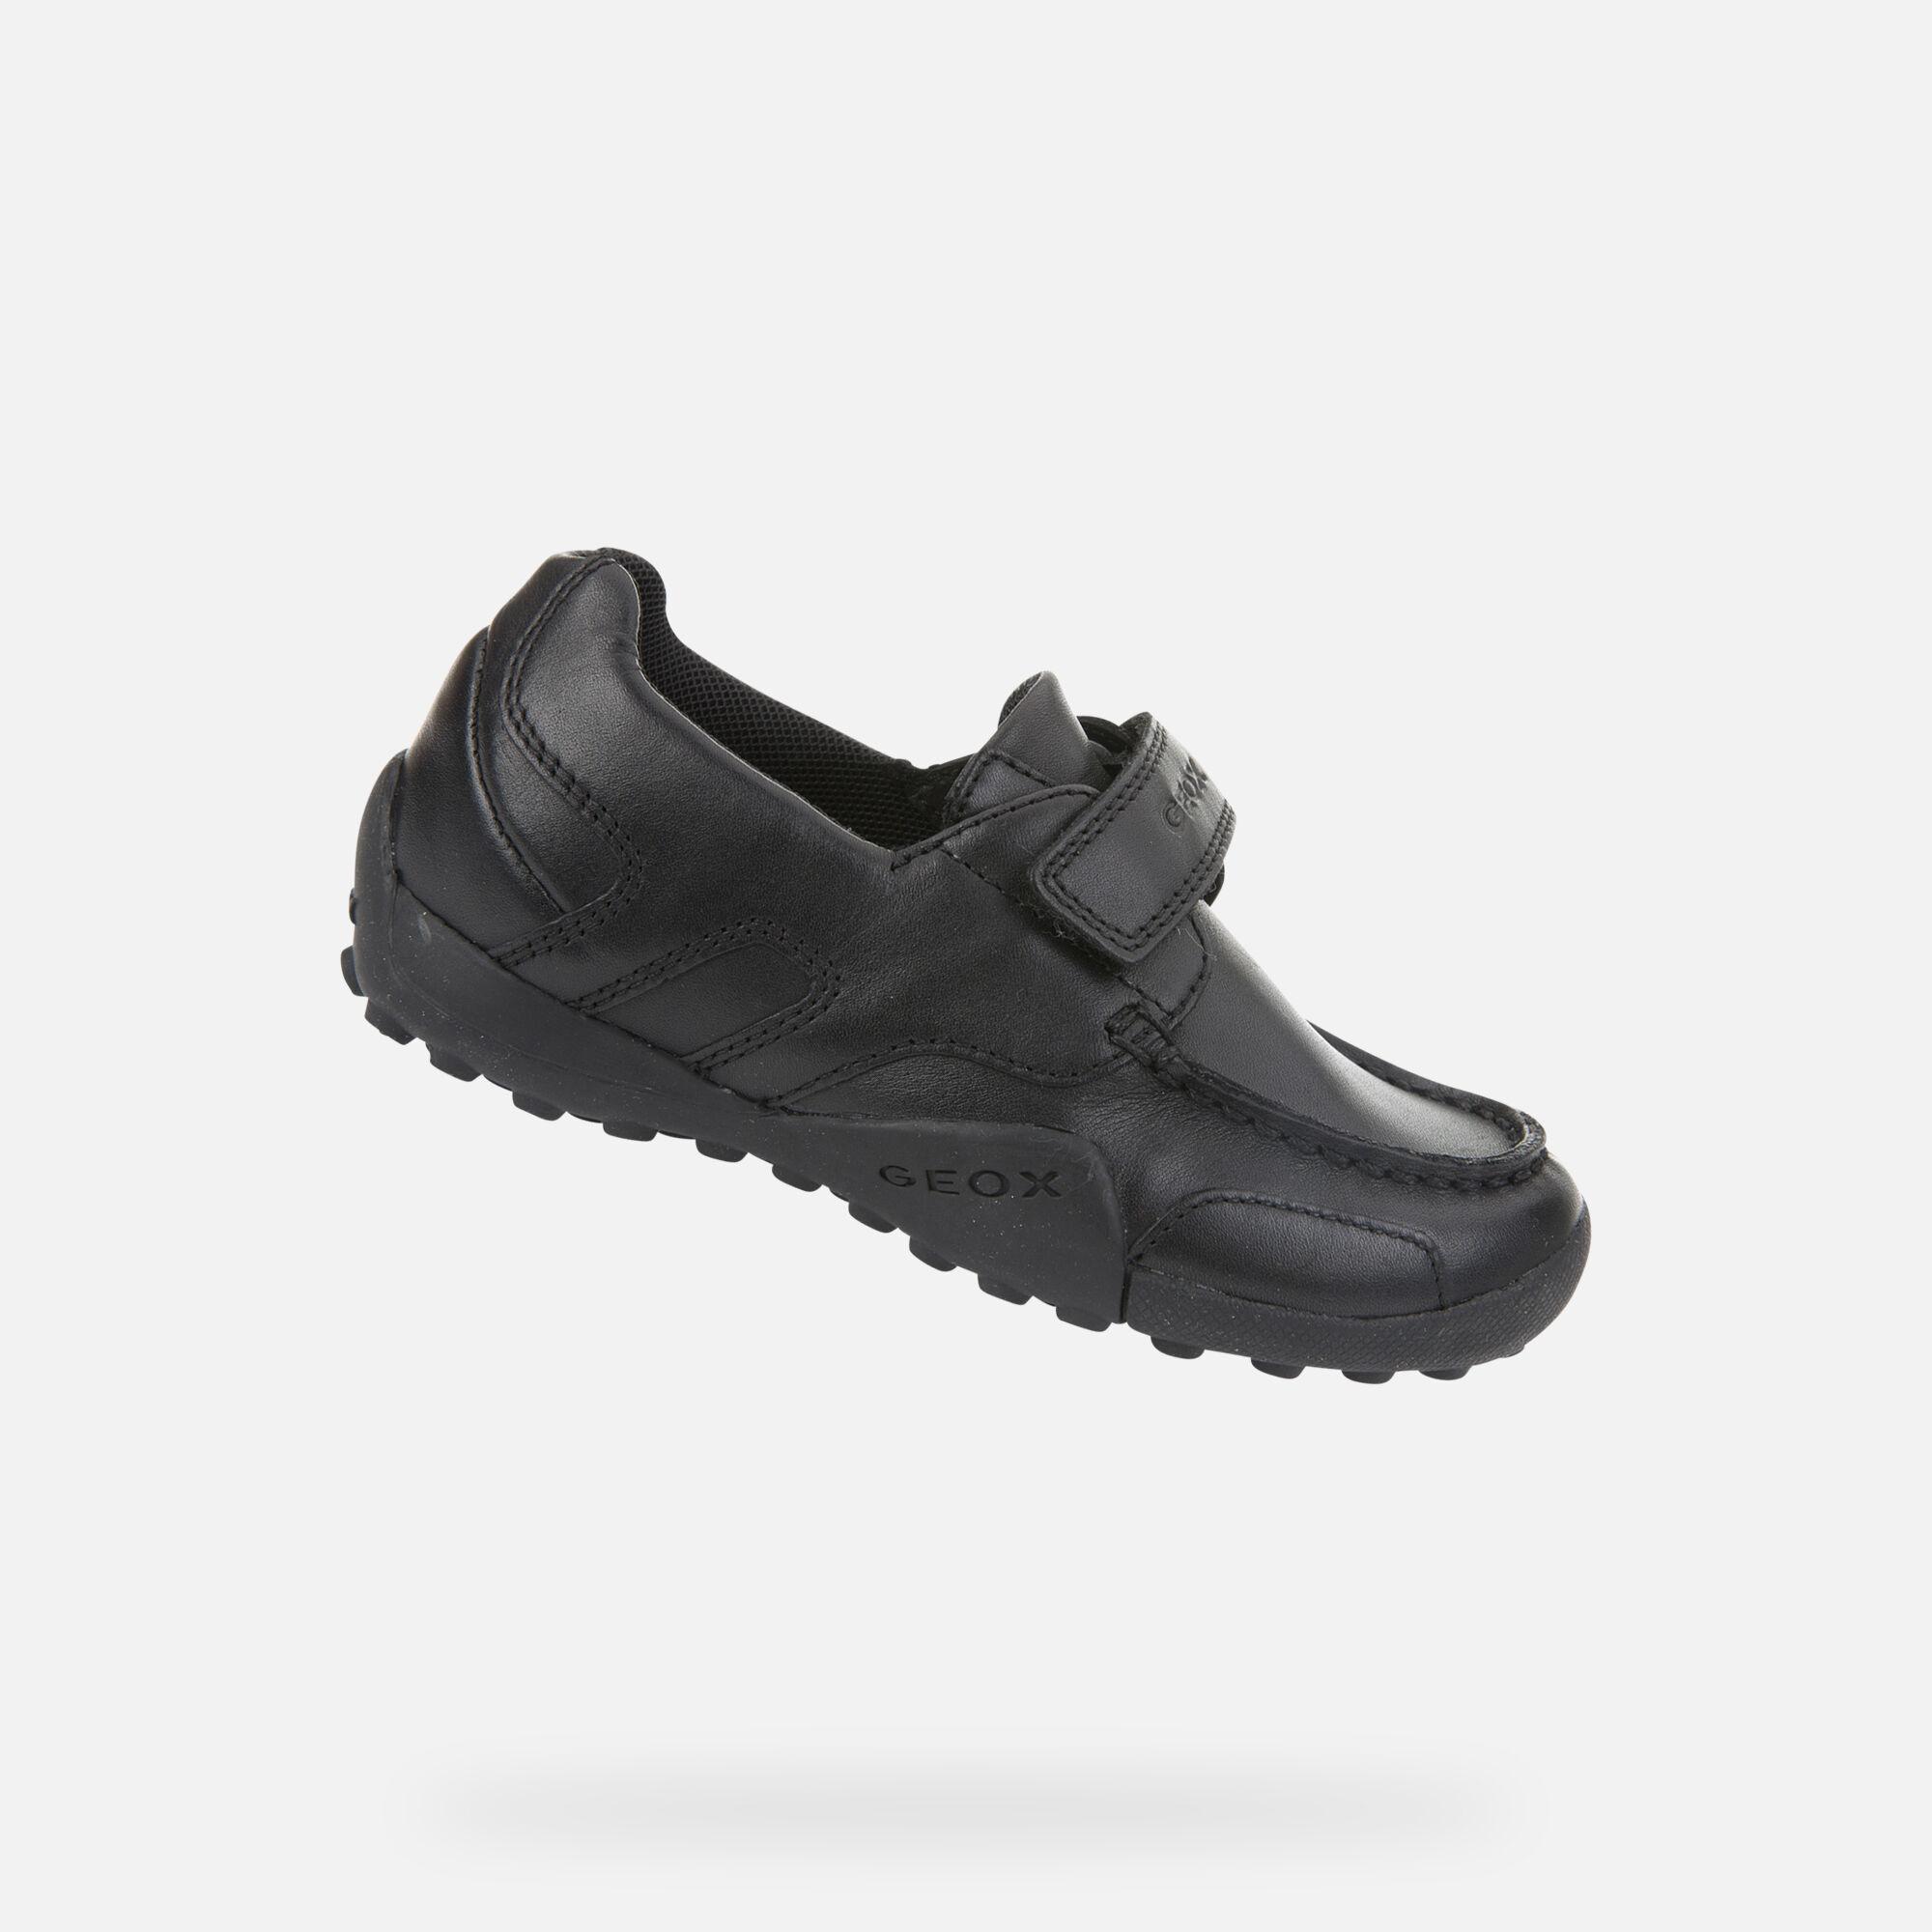 Uniforme Geox De Zapatos Jr Niño Snake qOX4wxt